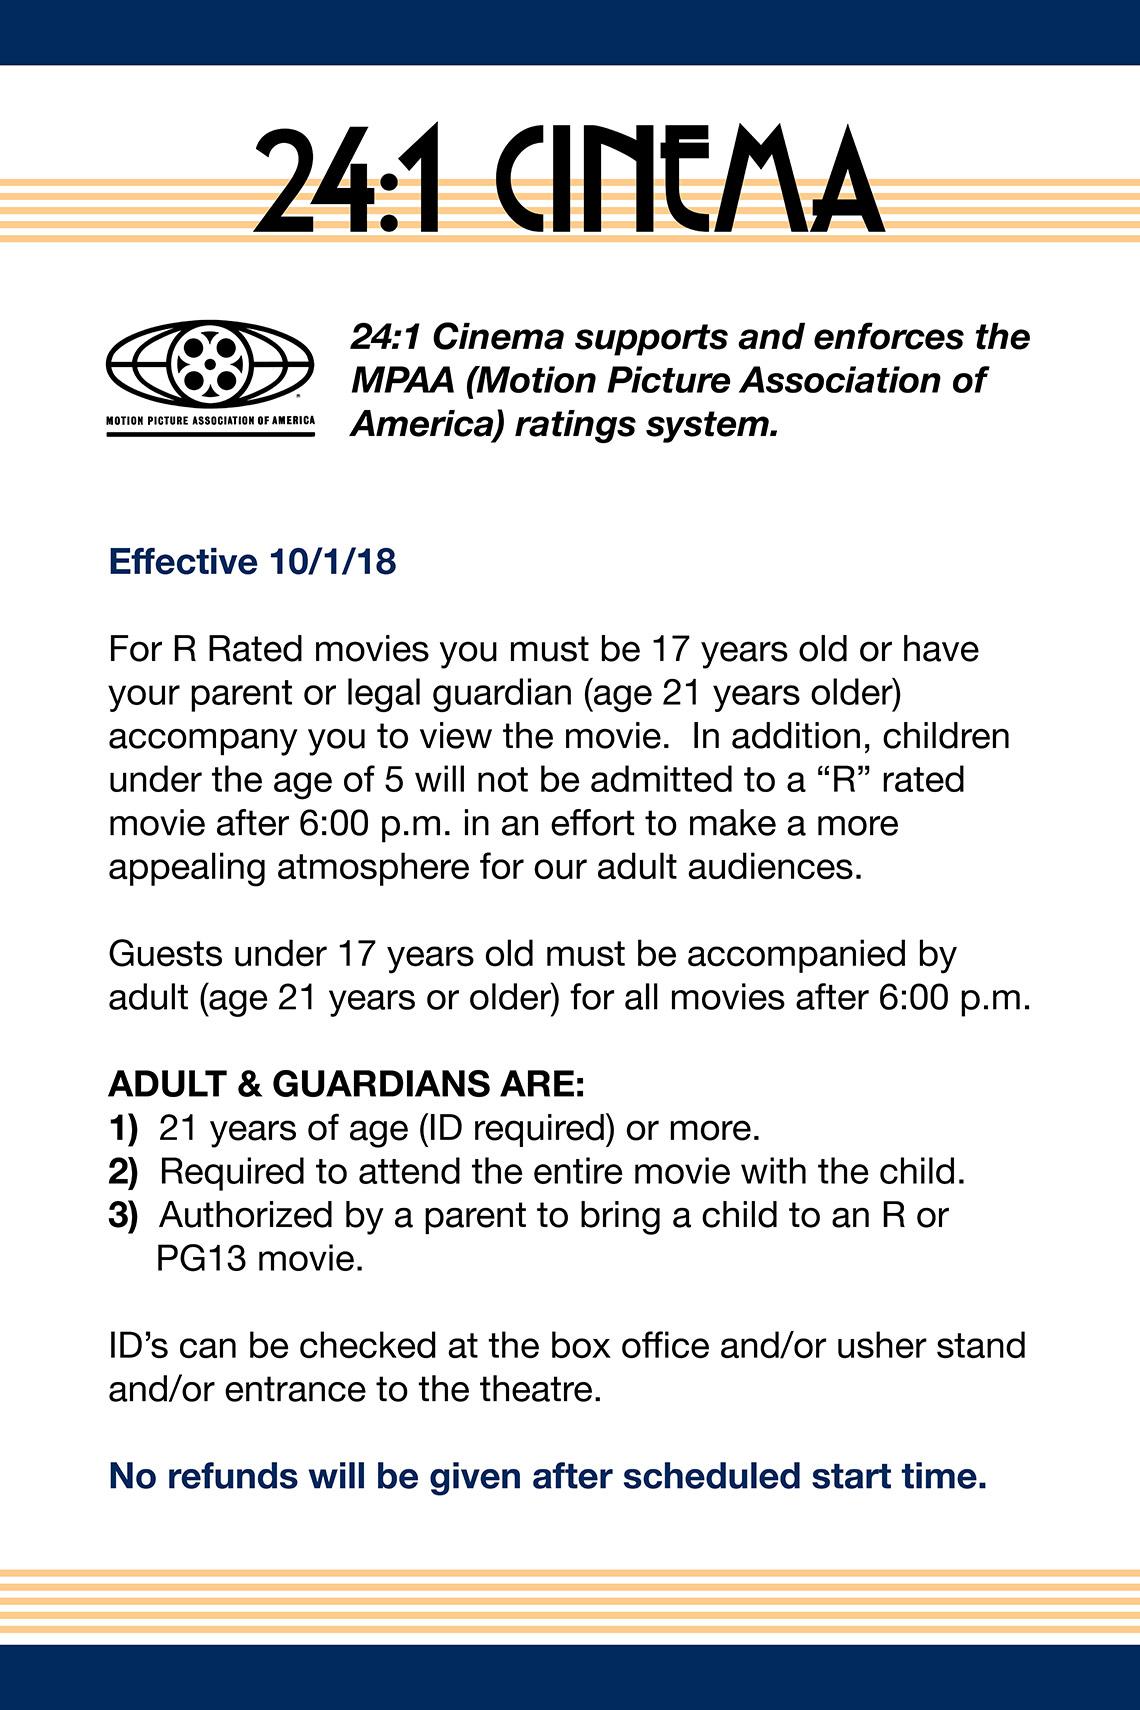 24 1 cinema ticket pricing